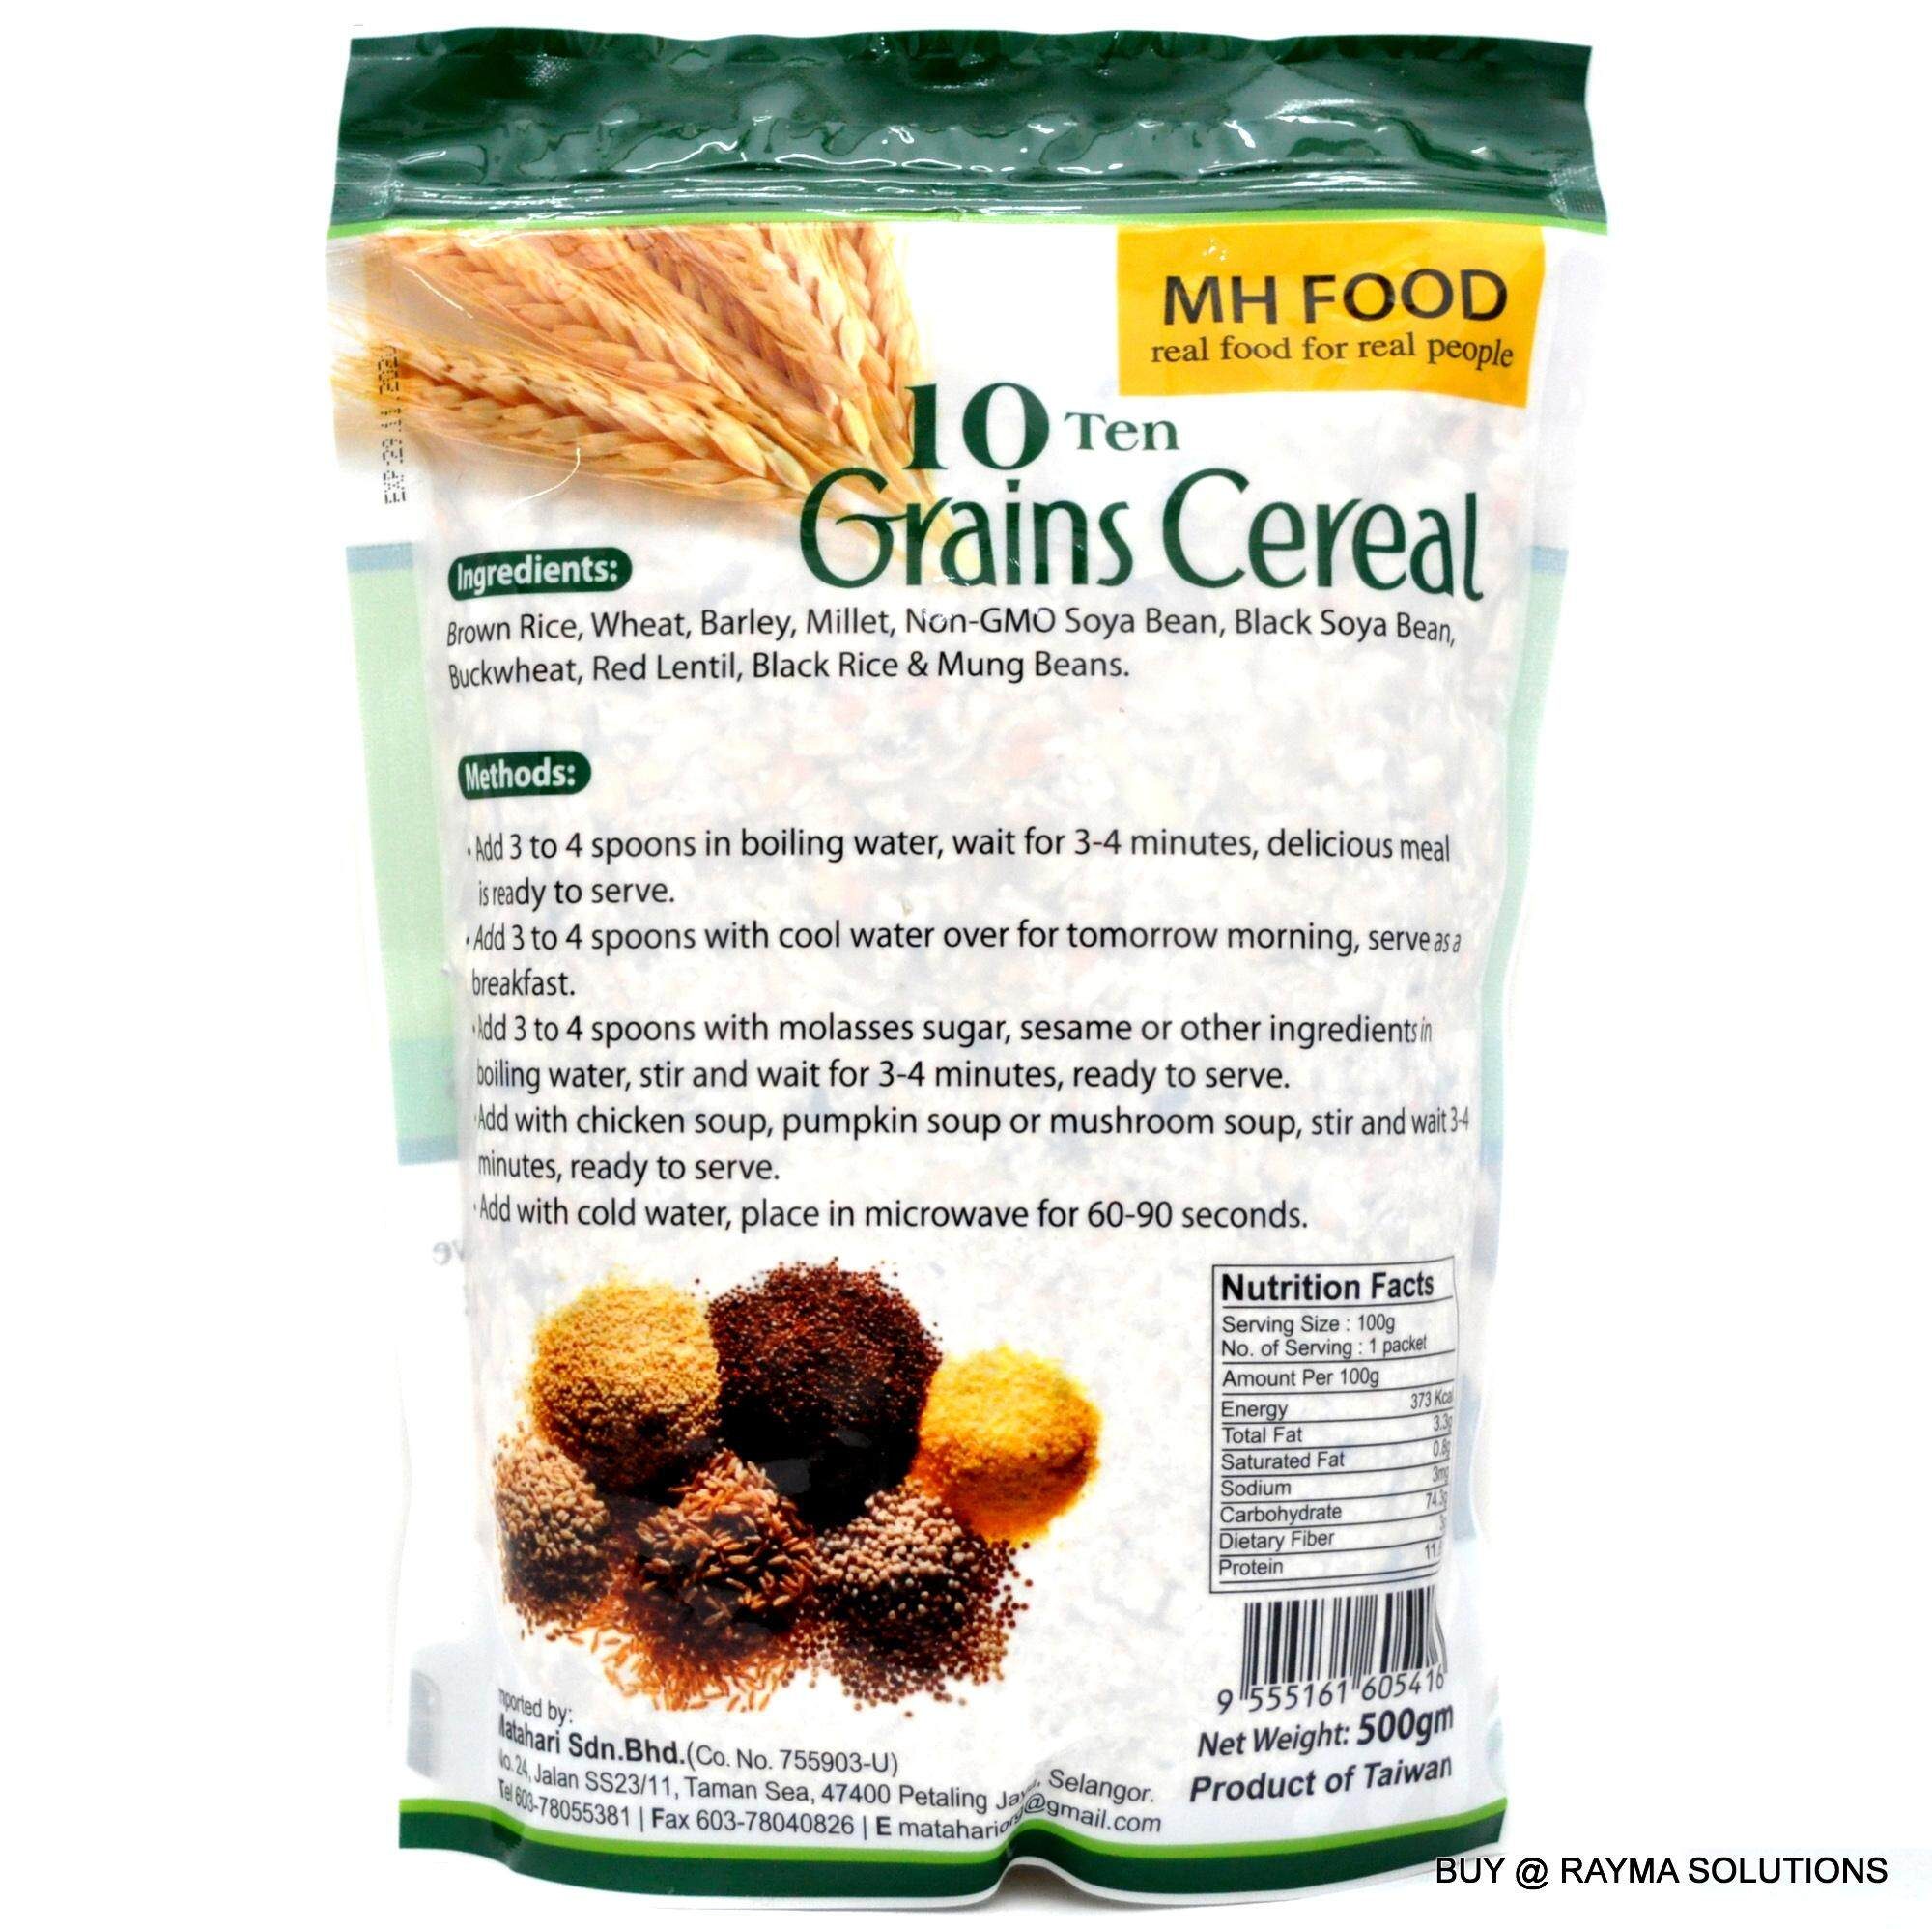 [Best Deal] MH FOOD 10 Grains Cereal, 500g (6 Packs)